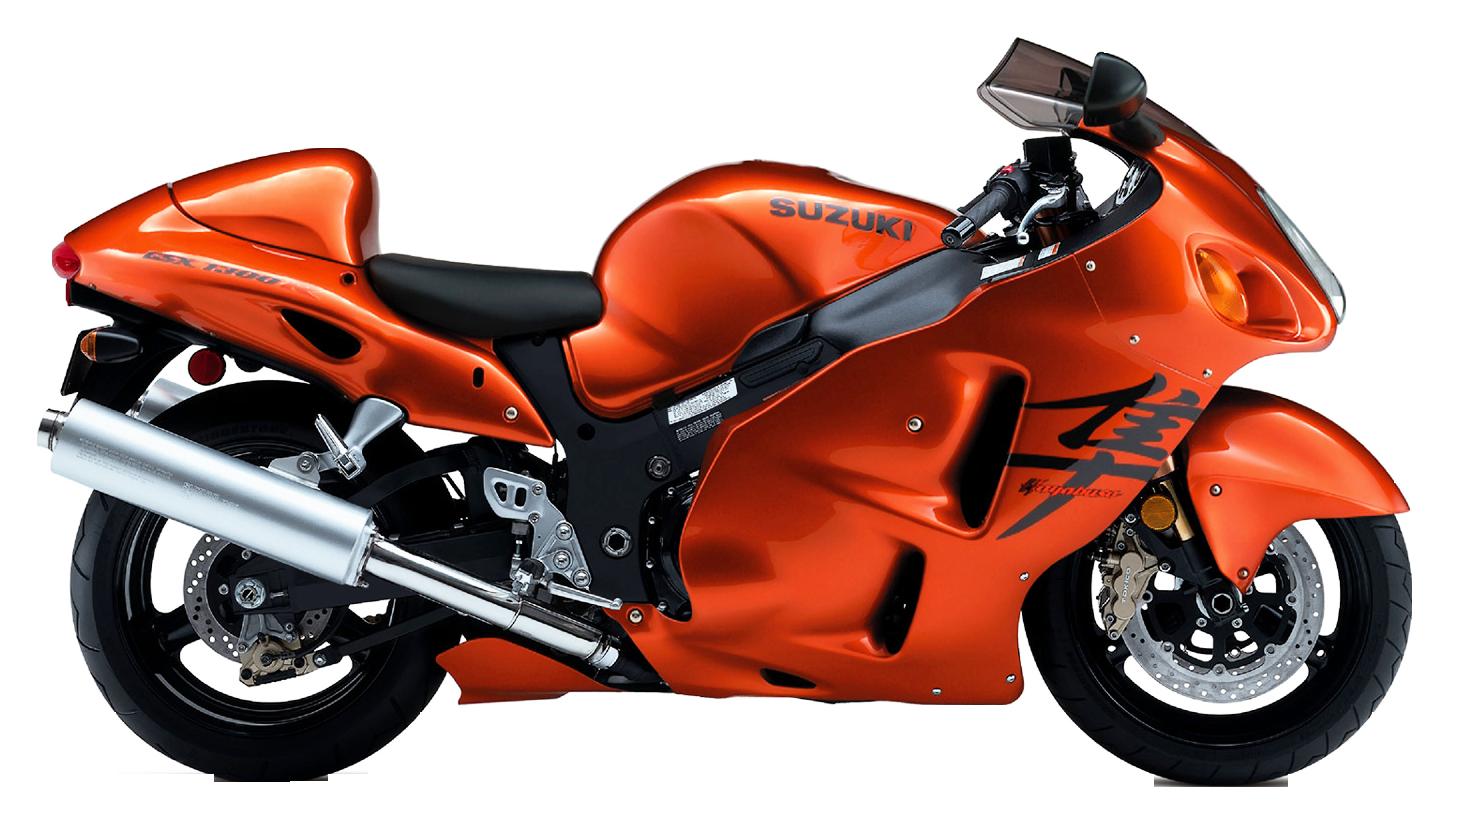 Suzuki sport bike png. Motorcycle clipart hayabusa